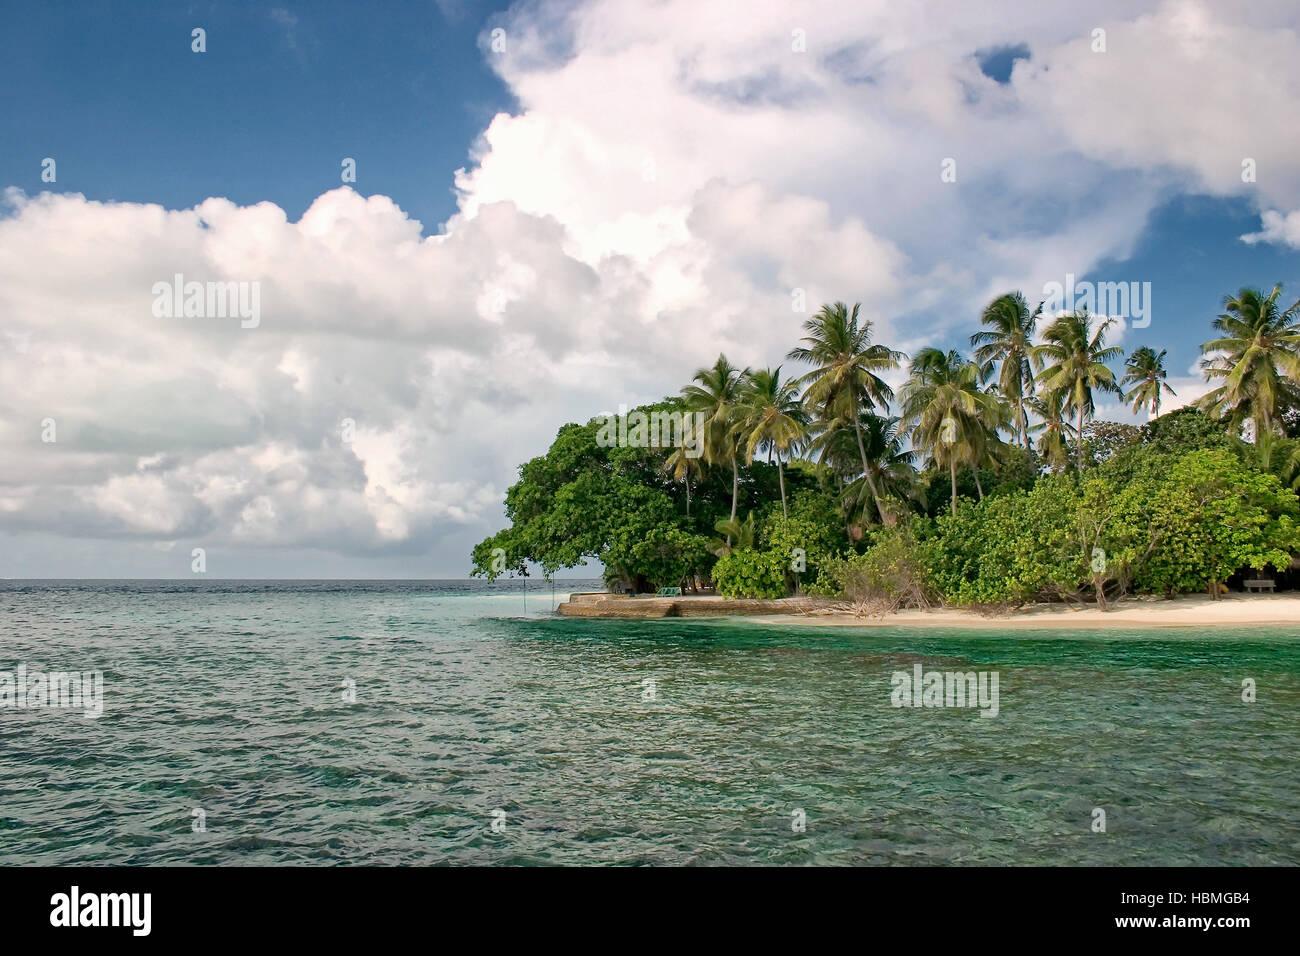 Maldive Islands Stock Photo